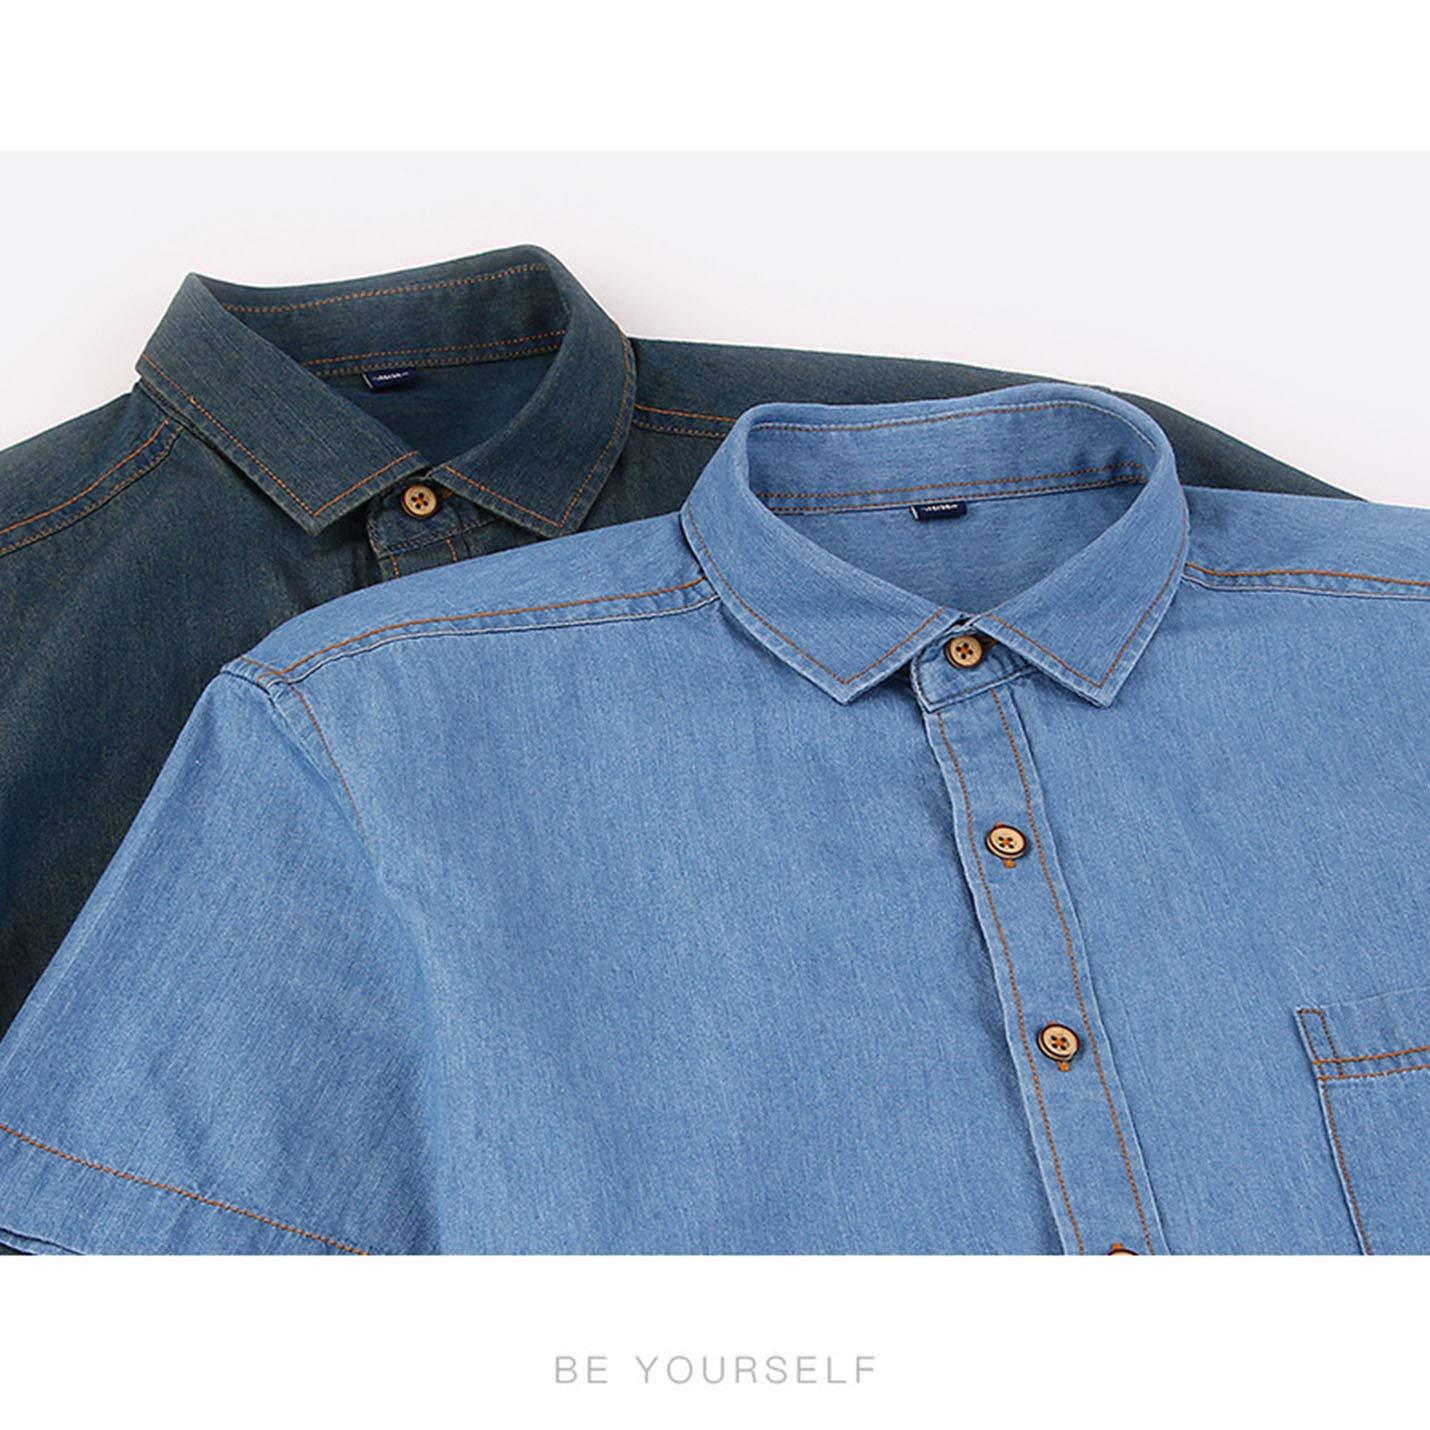 Flygo Mens Boasic Short Sleeve Button Down Denim Shirts